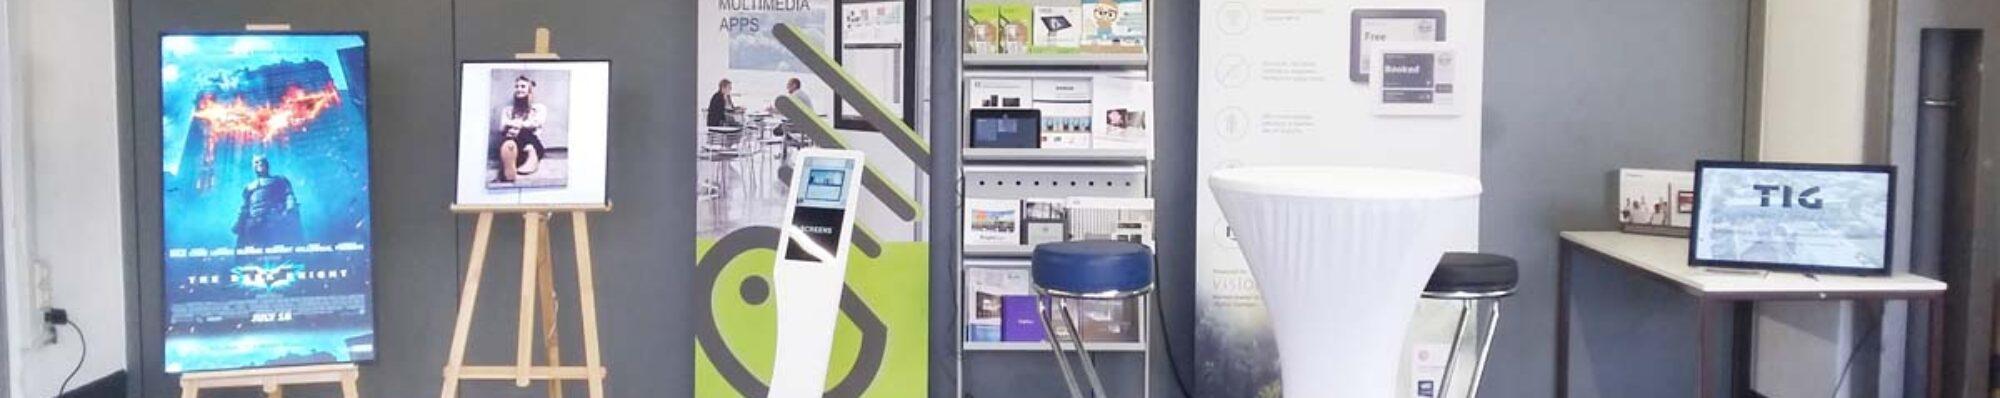 SIGNAMEDIA Digitale Werbesysteme e.K.